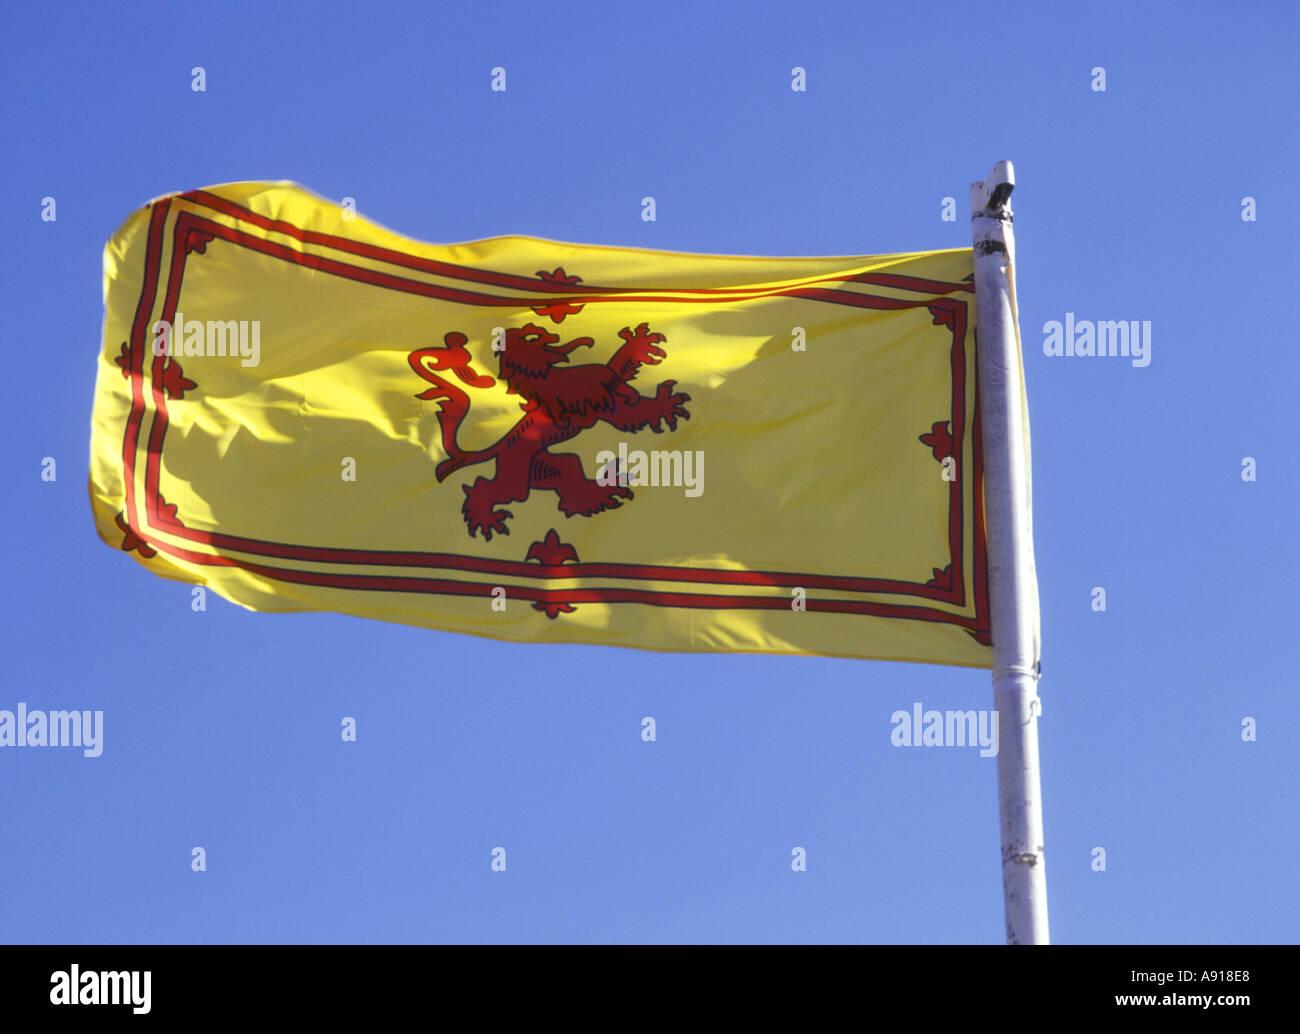 dh  FLAG SCOTLAND Royal Standard of Scotland Scottish Rampant Lion Flag bhz Stock Photo